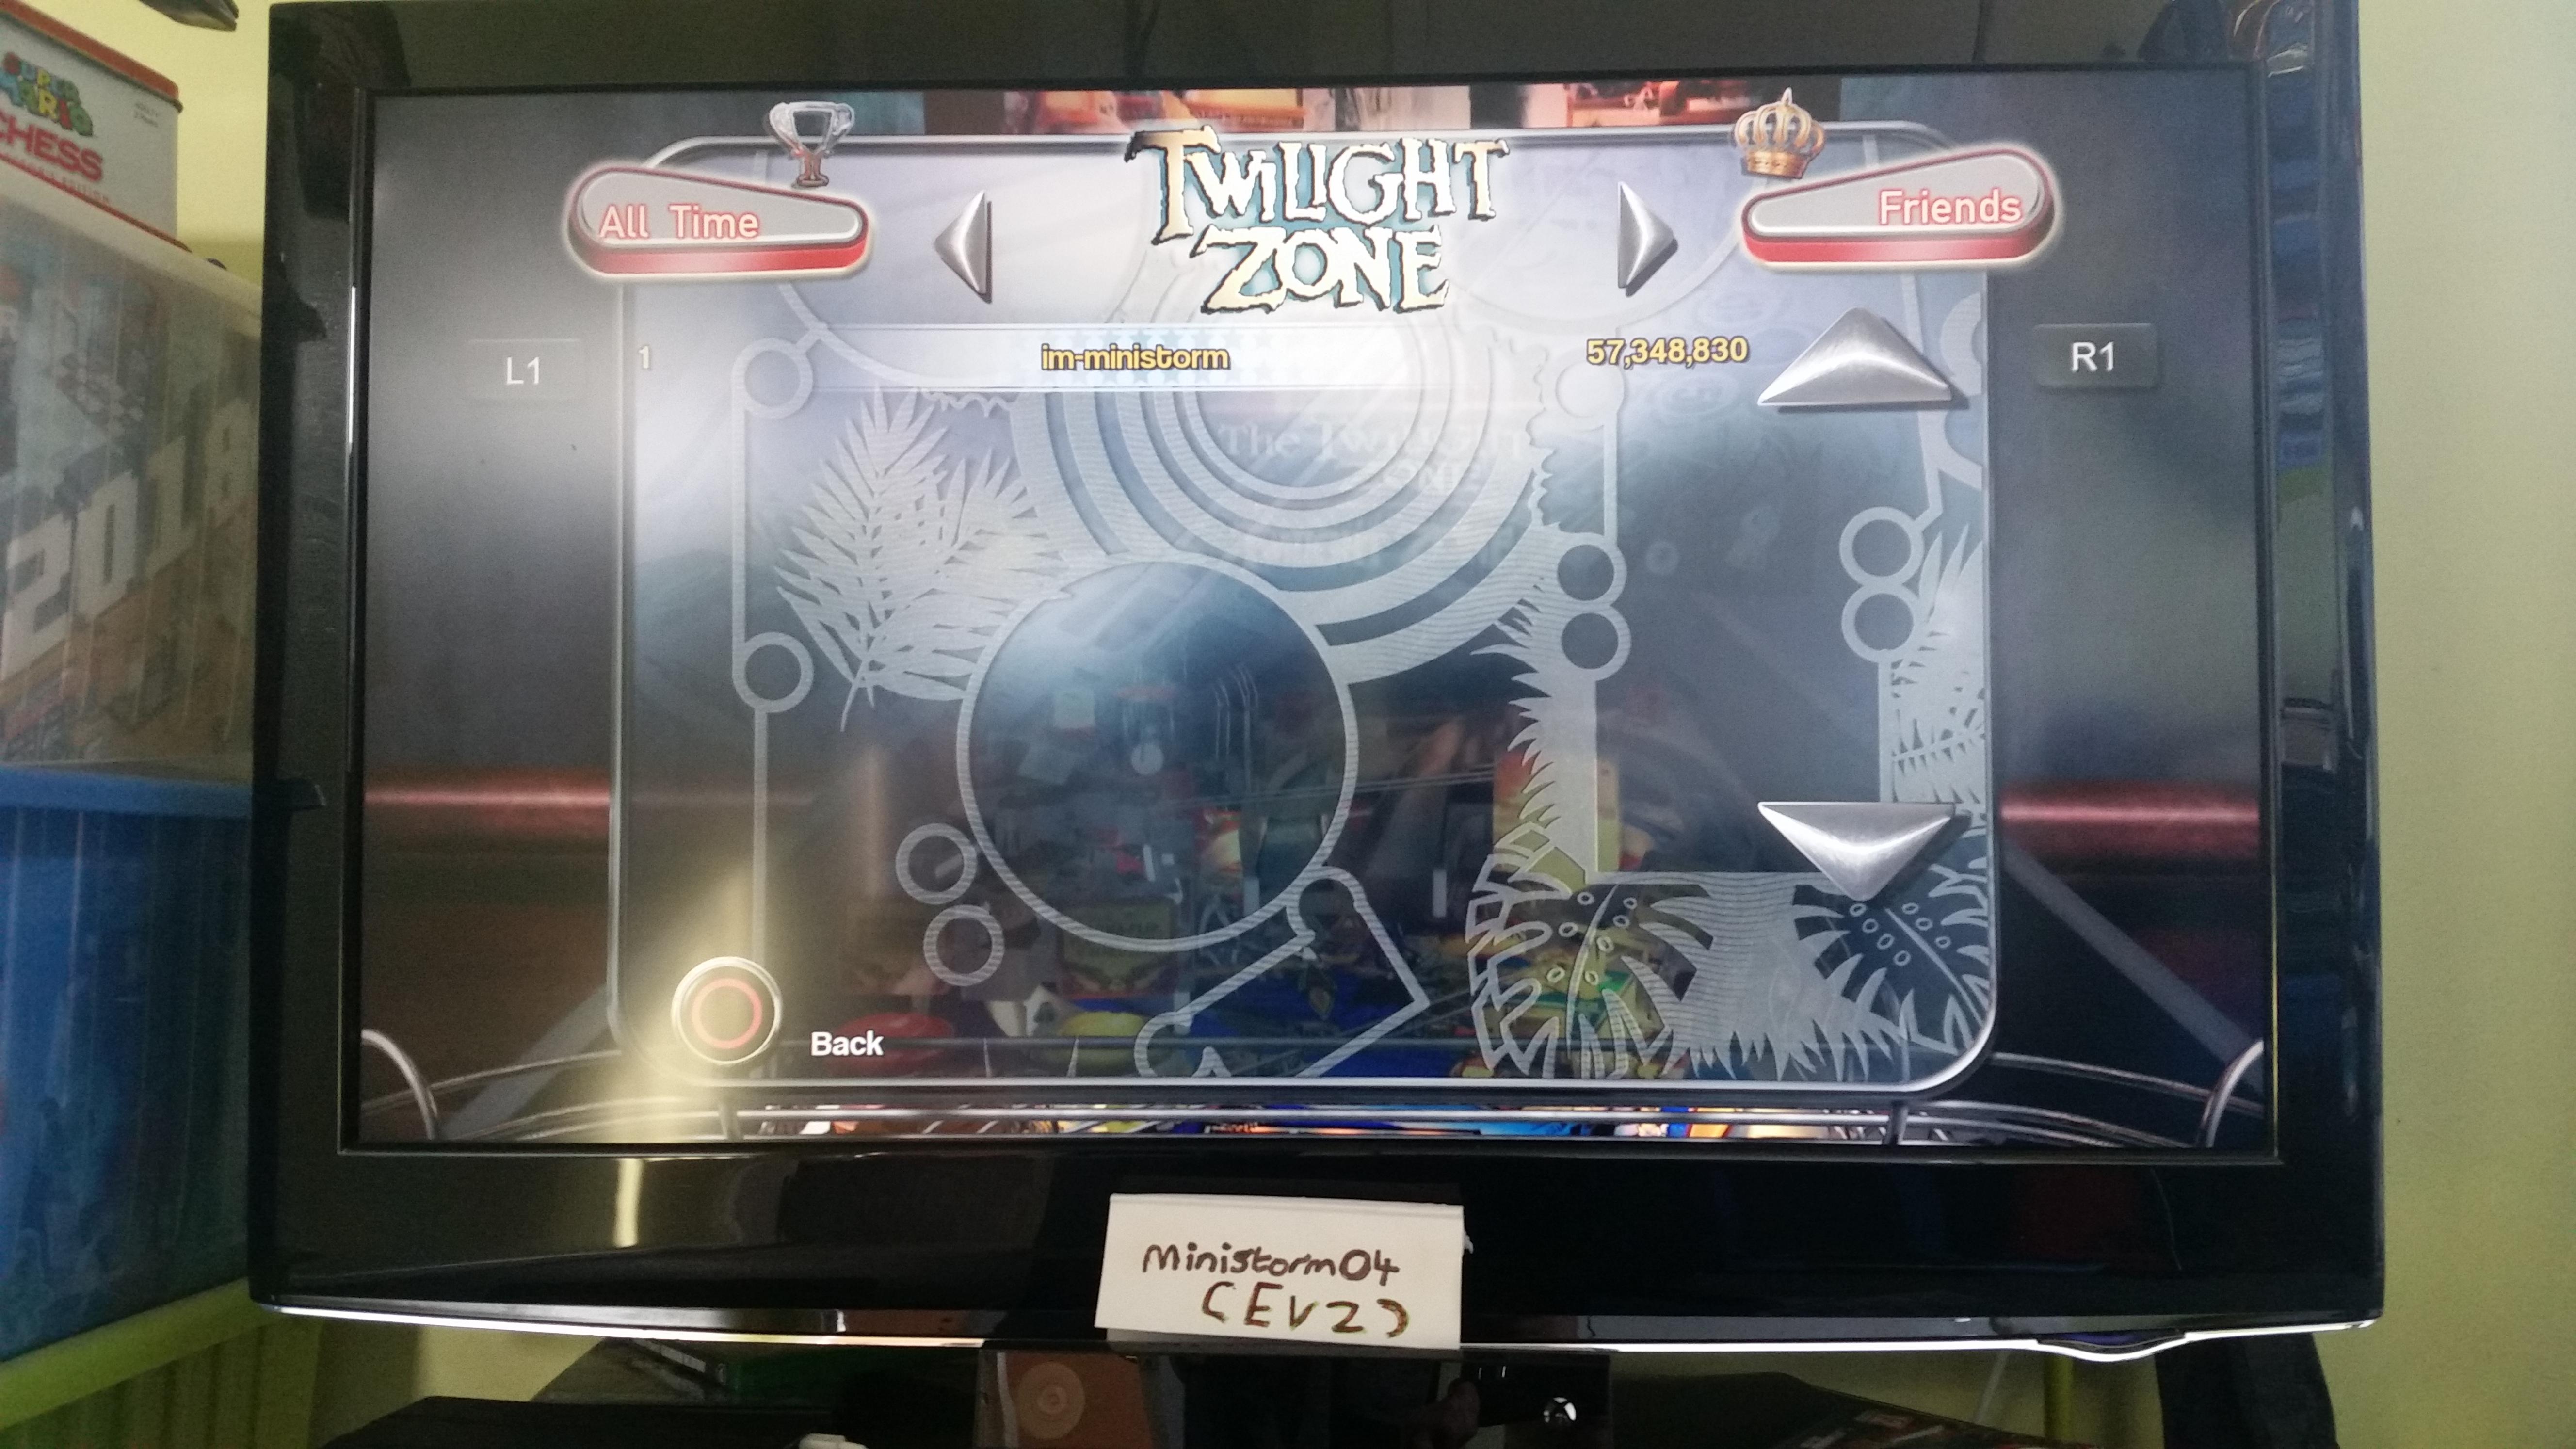 ministorm04: Pinball Arcade: Twilight Zone (Playstation 4) 57,348,830 points on 2019-06-03 12:36:04